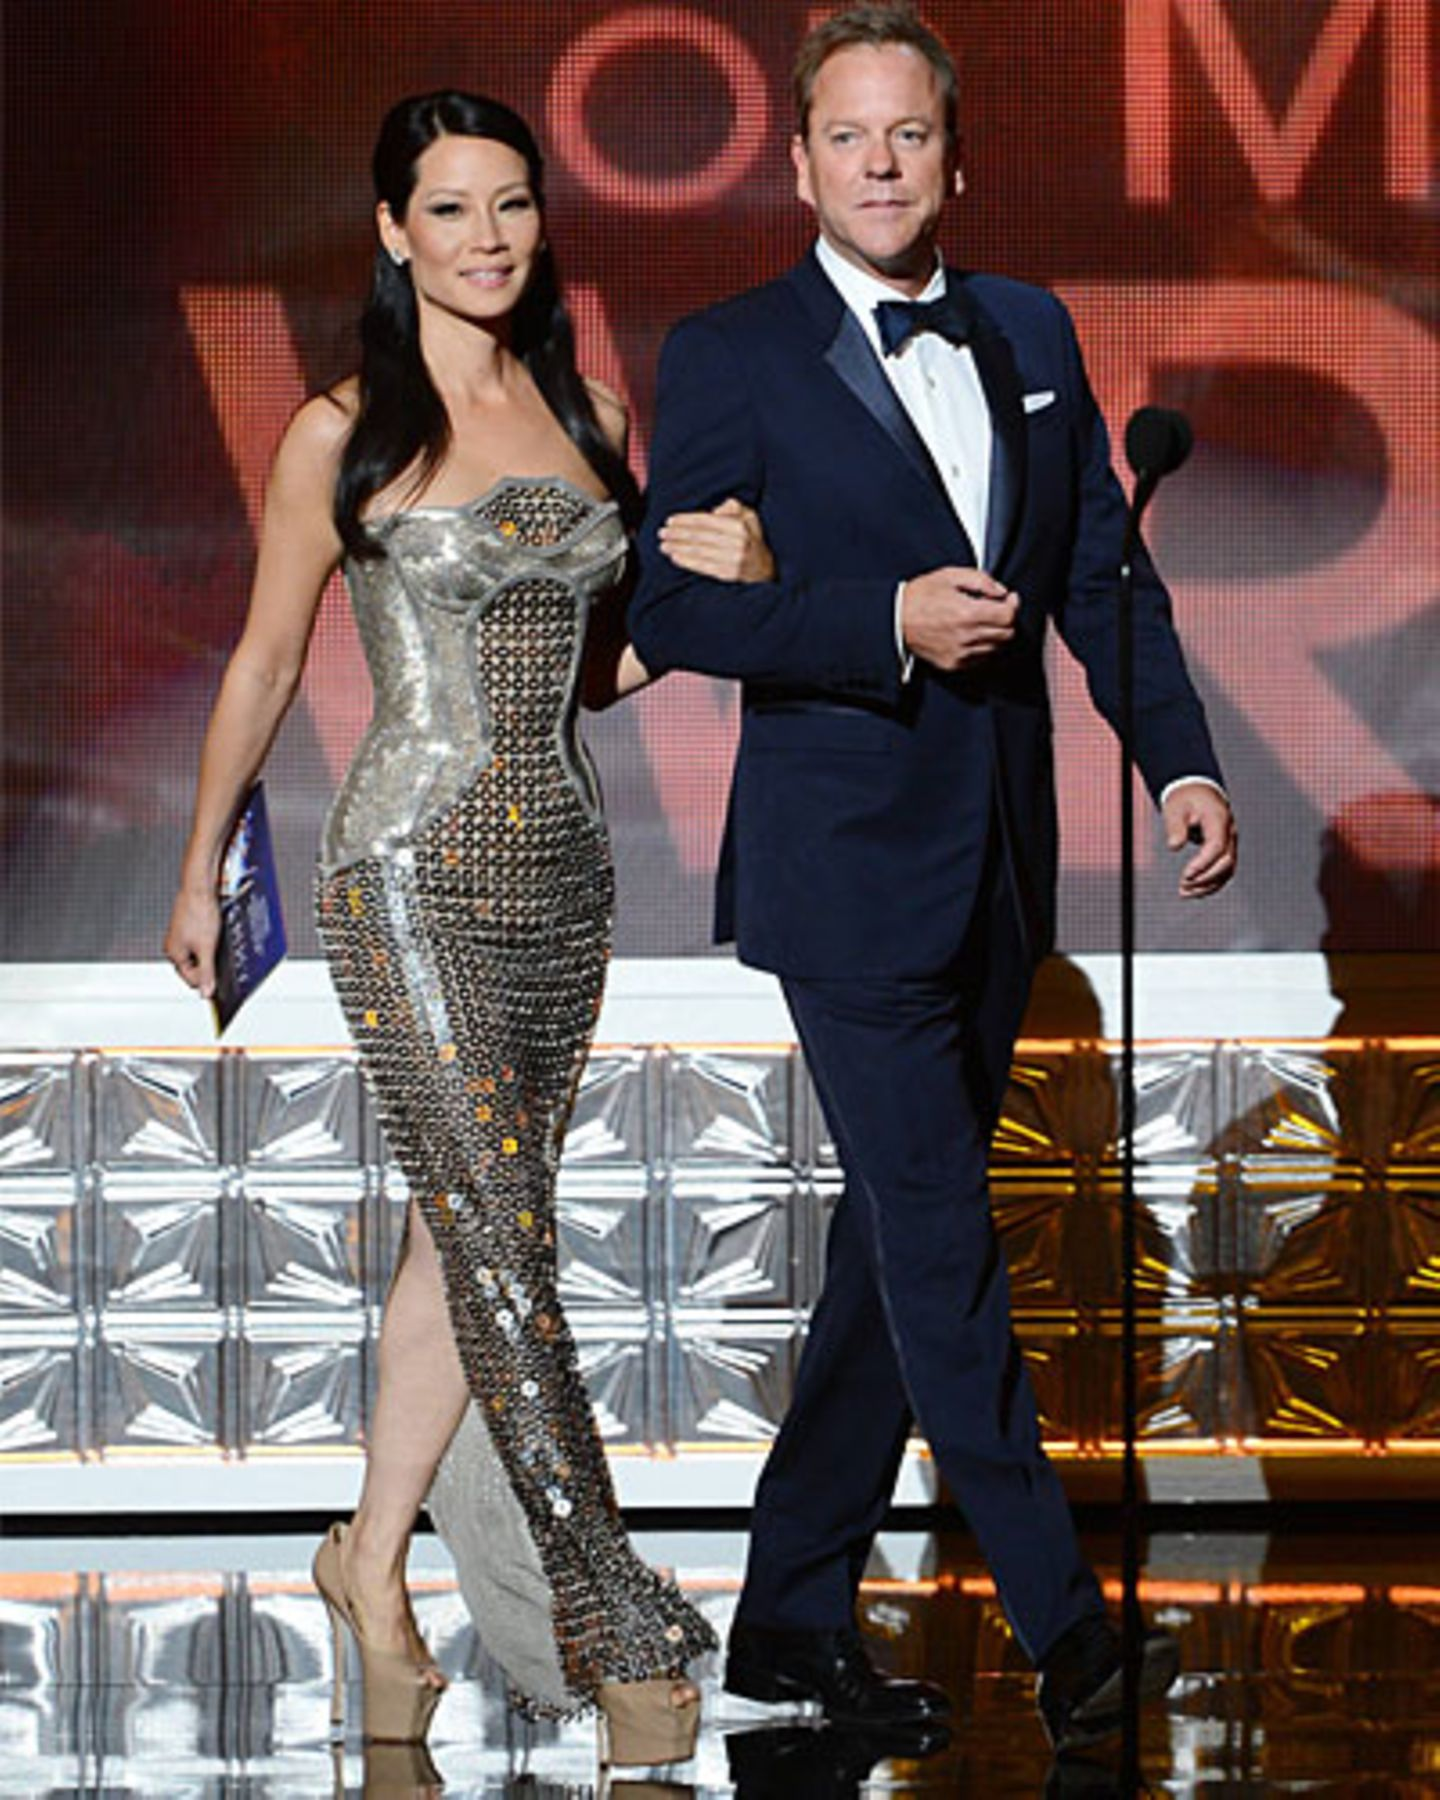 Lucy Liu & Kiefer Sutherland